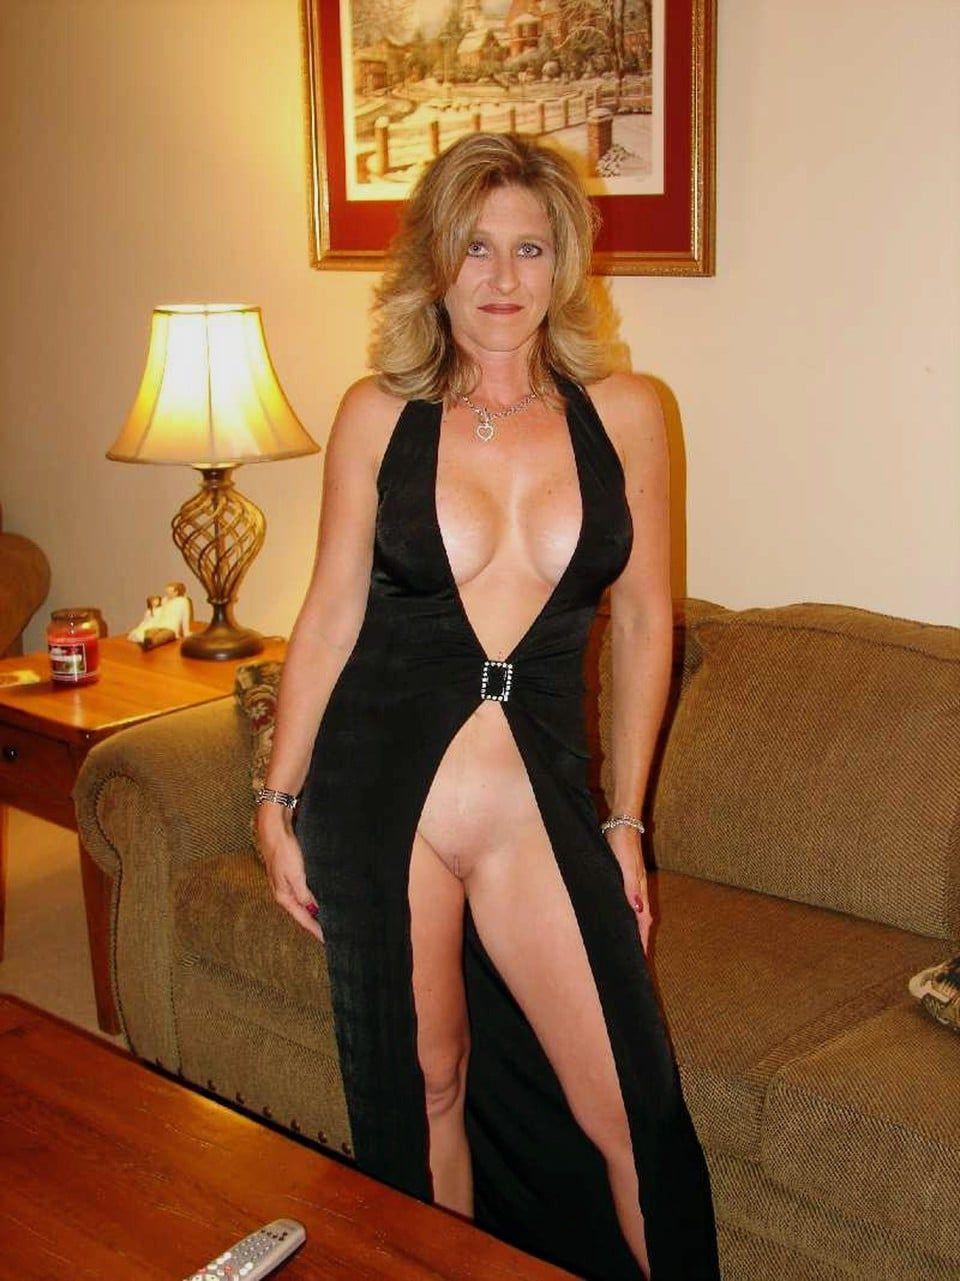 Whore wives dressed like sluts phrase consider